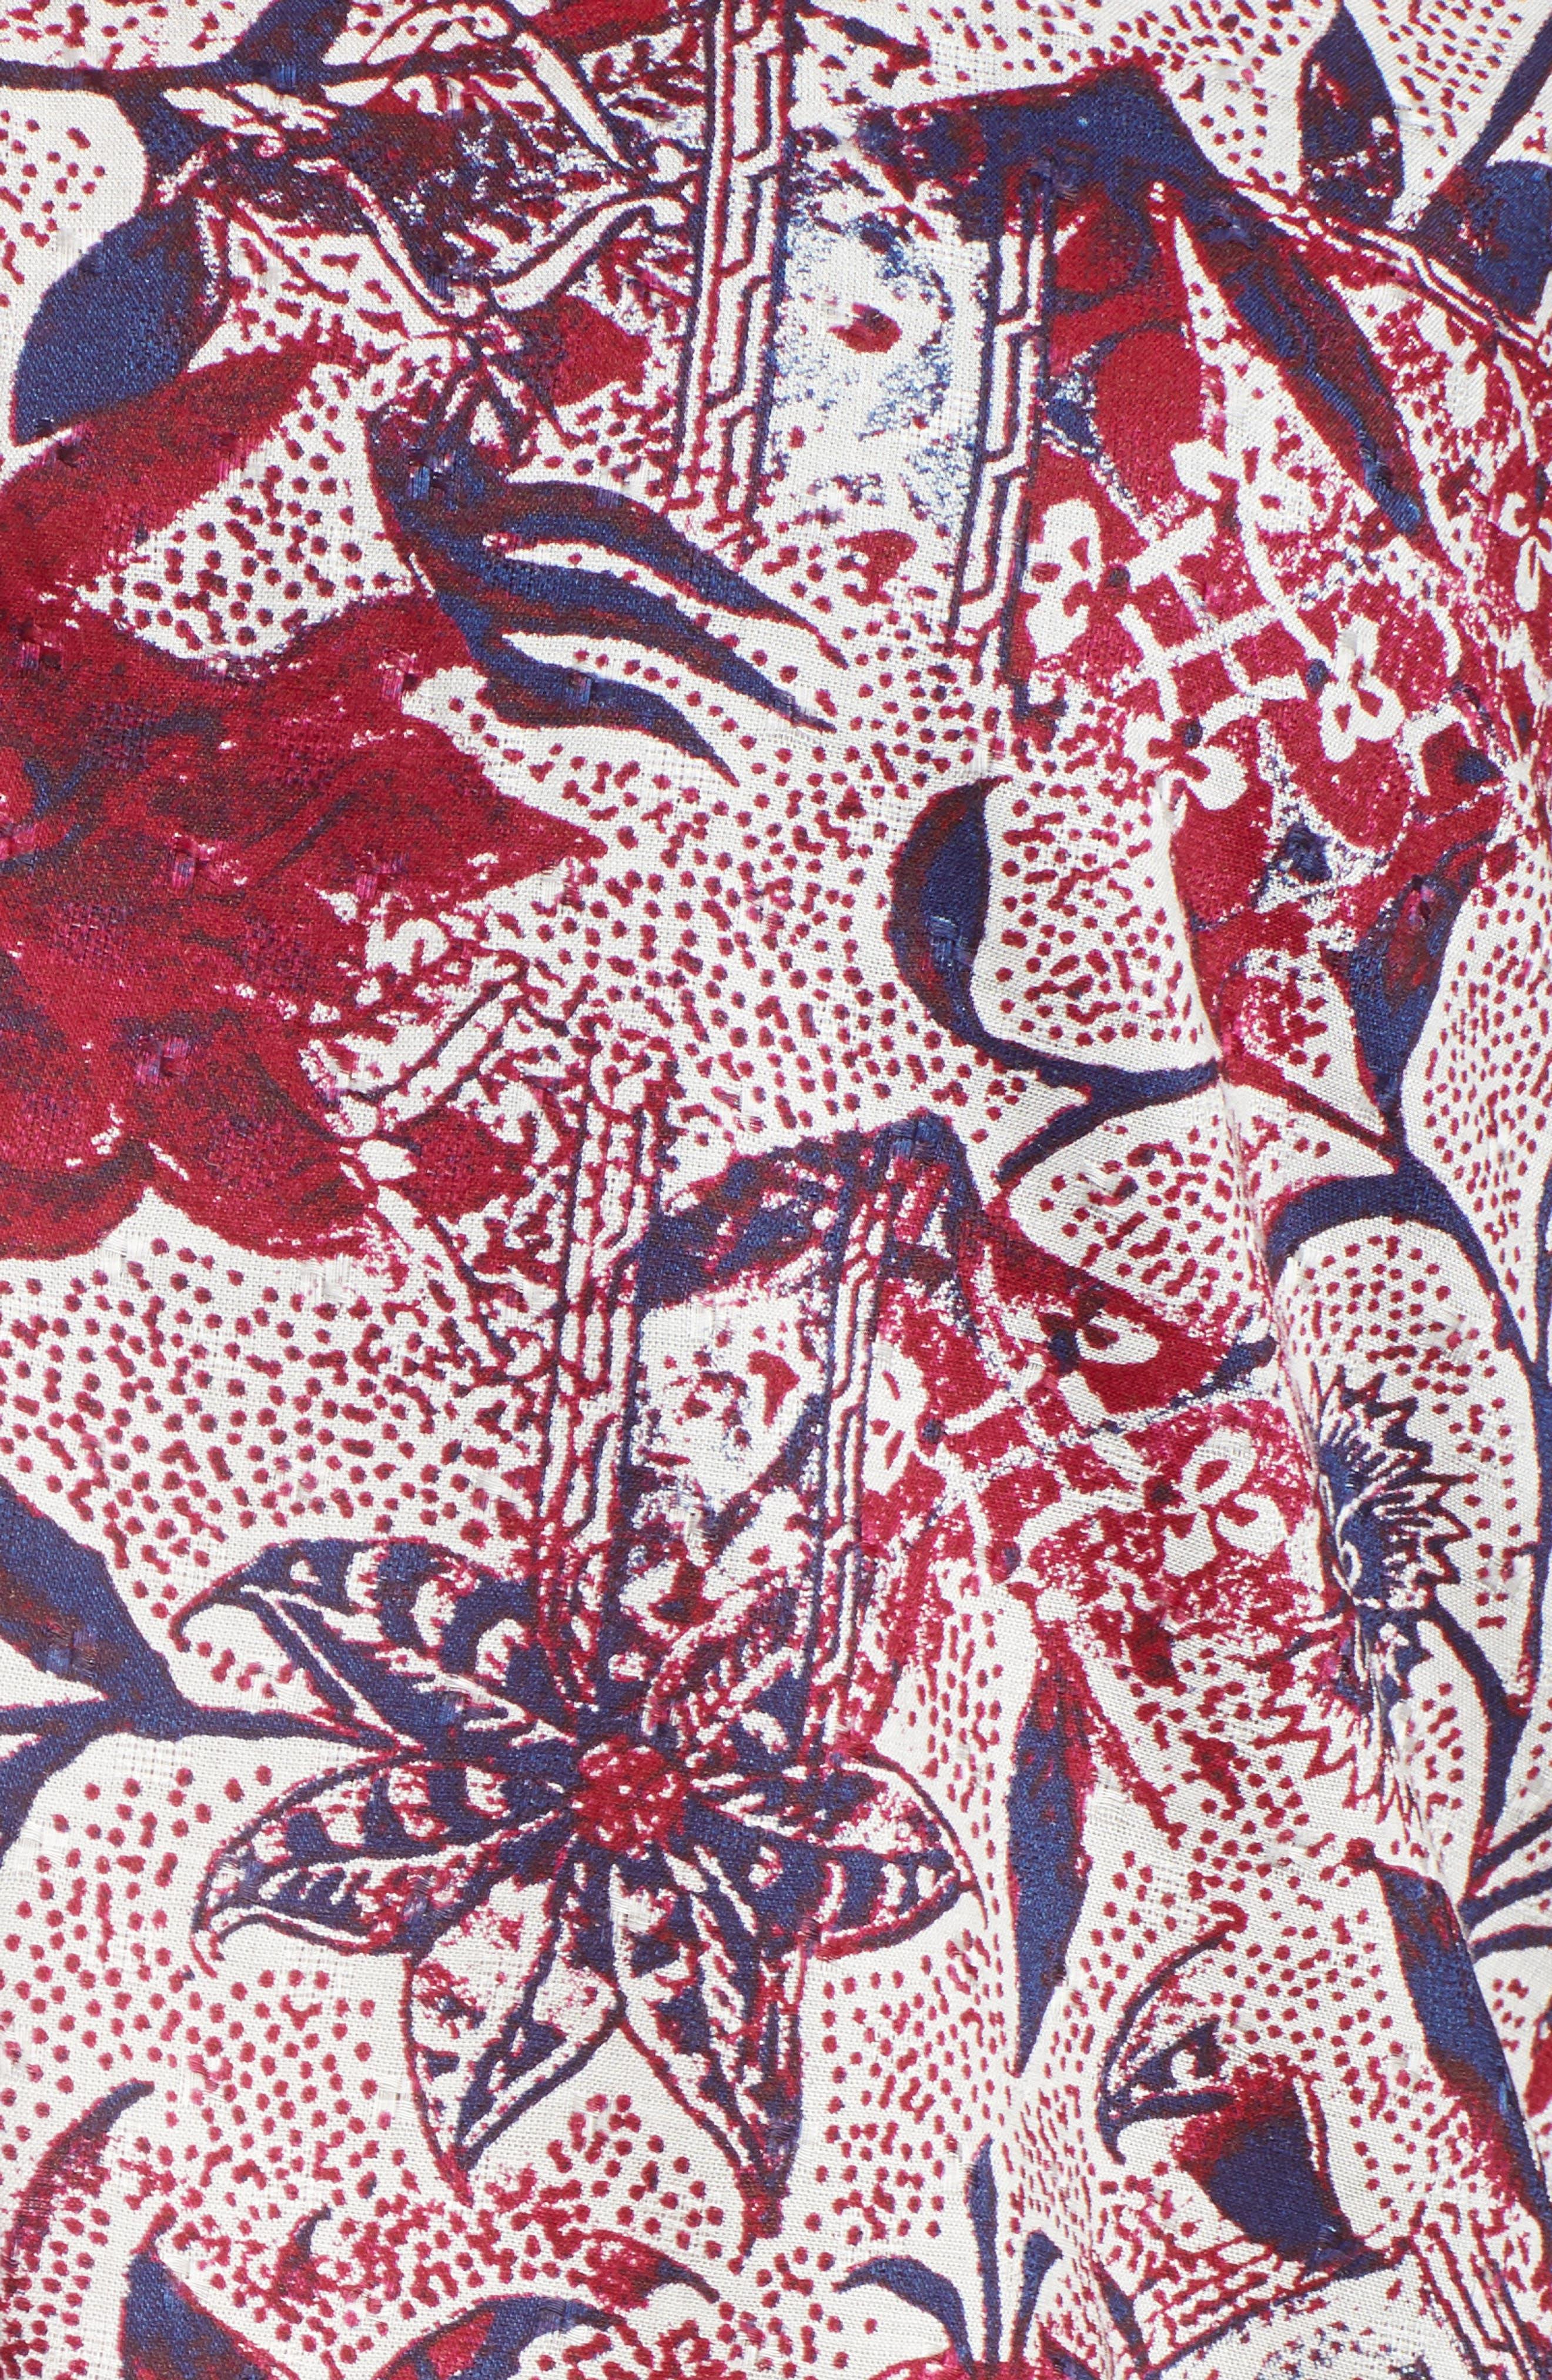 Floral Print Top,                             Alternate thumbnail 5, color,                             RASPBERRY MULTI